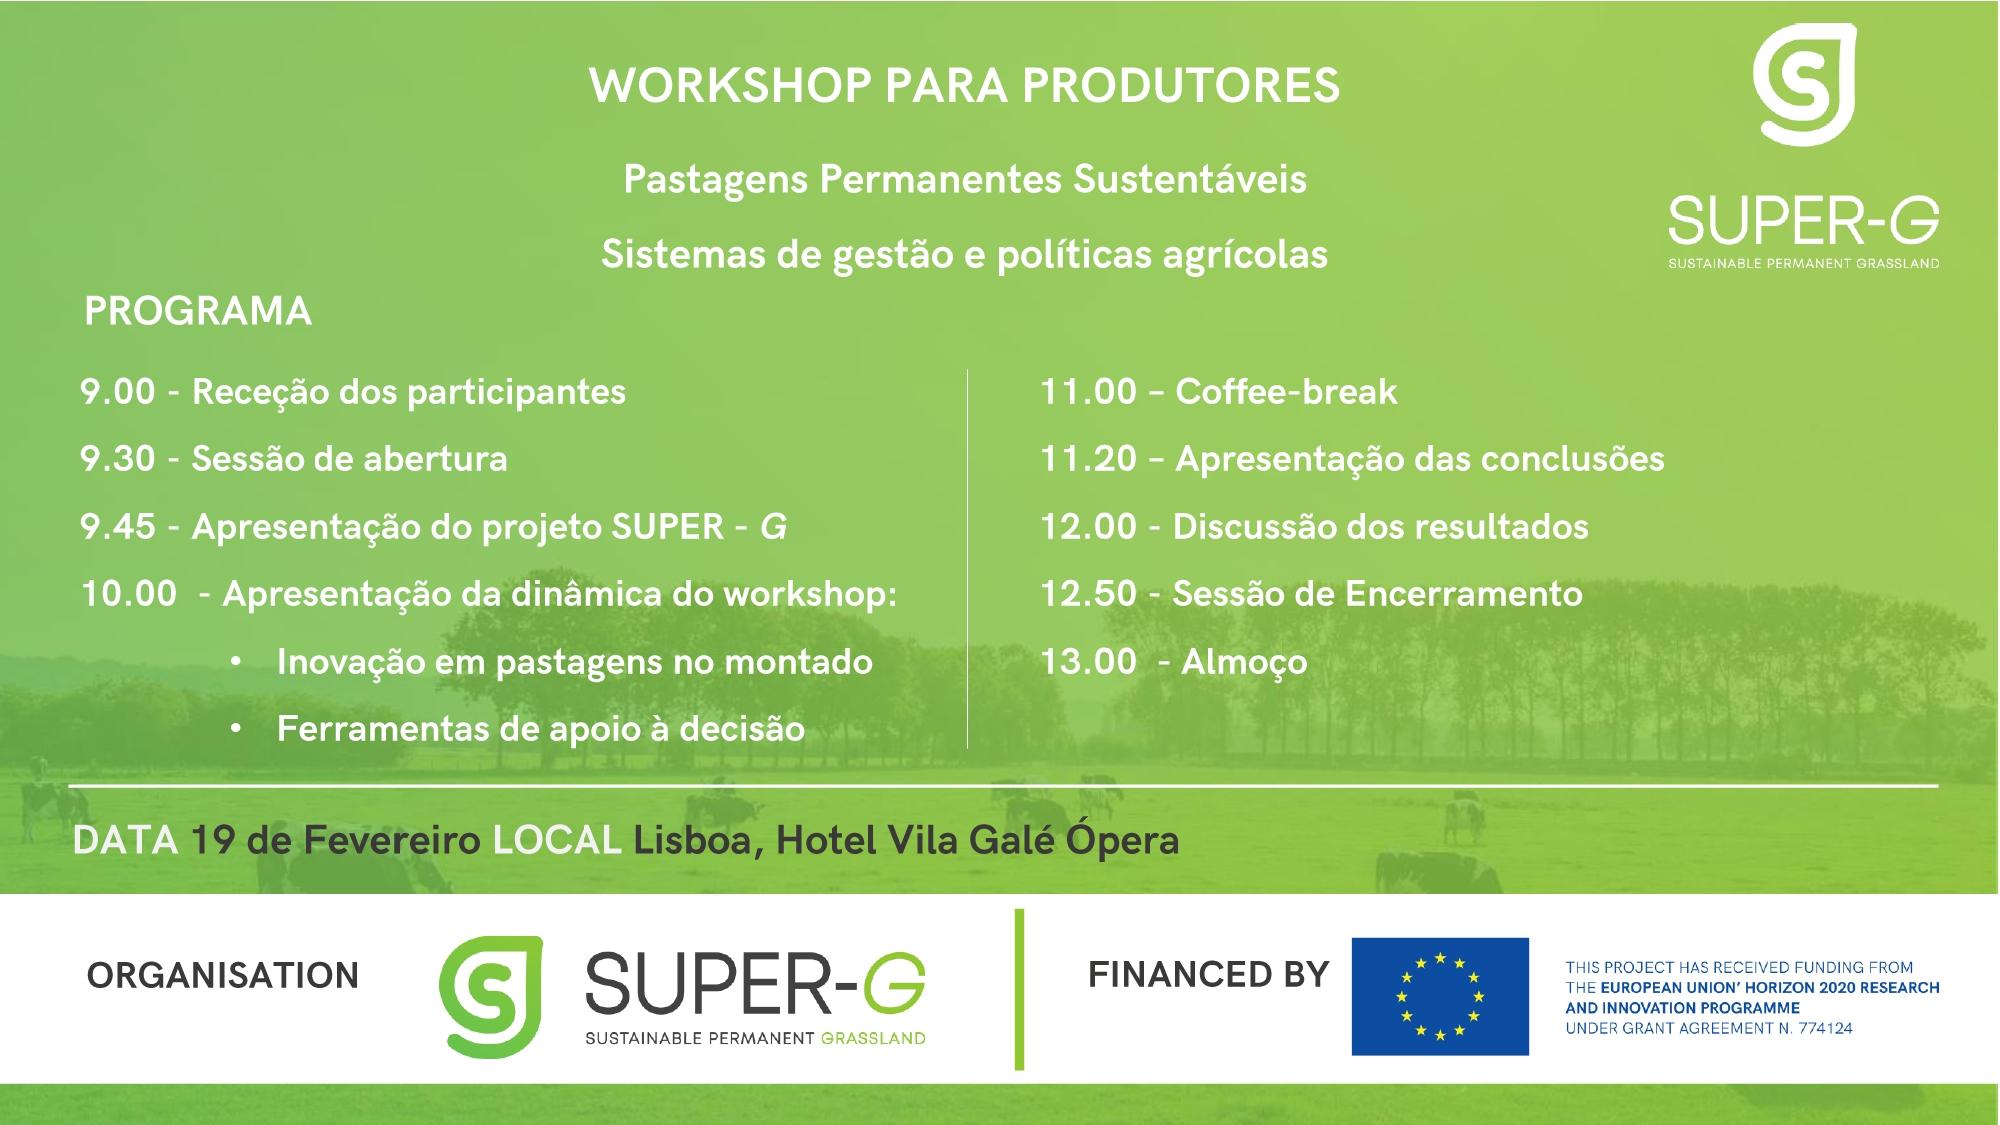 Workshop para produtores – Projeto SUPER-G